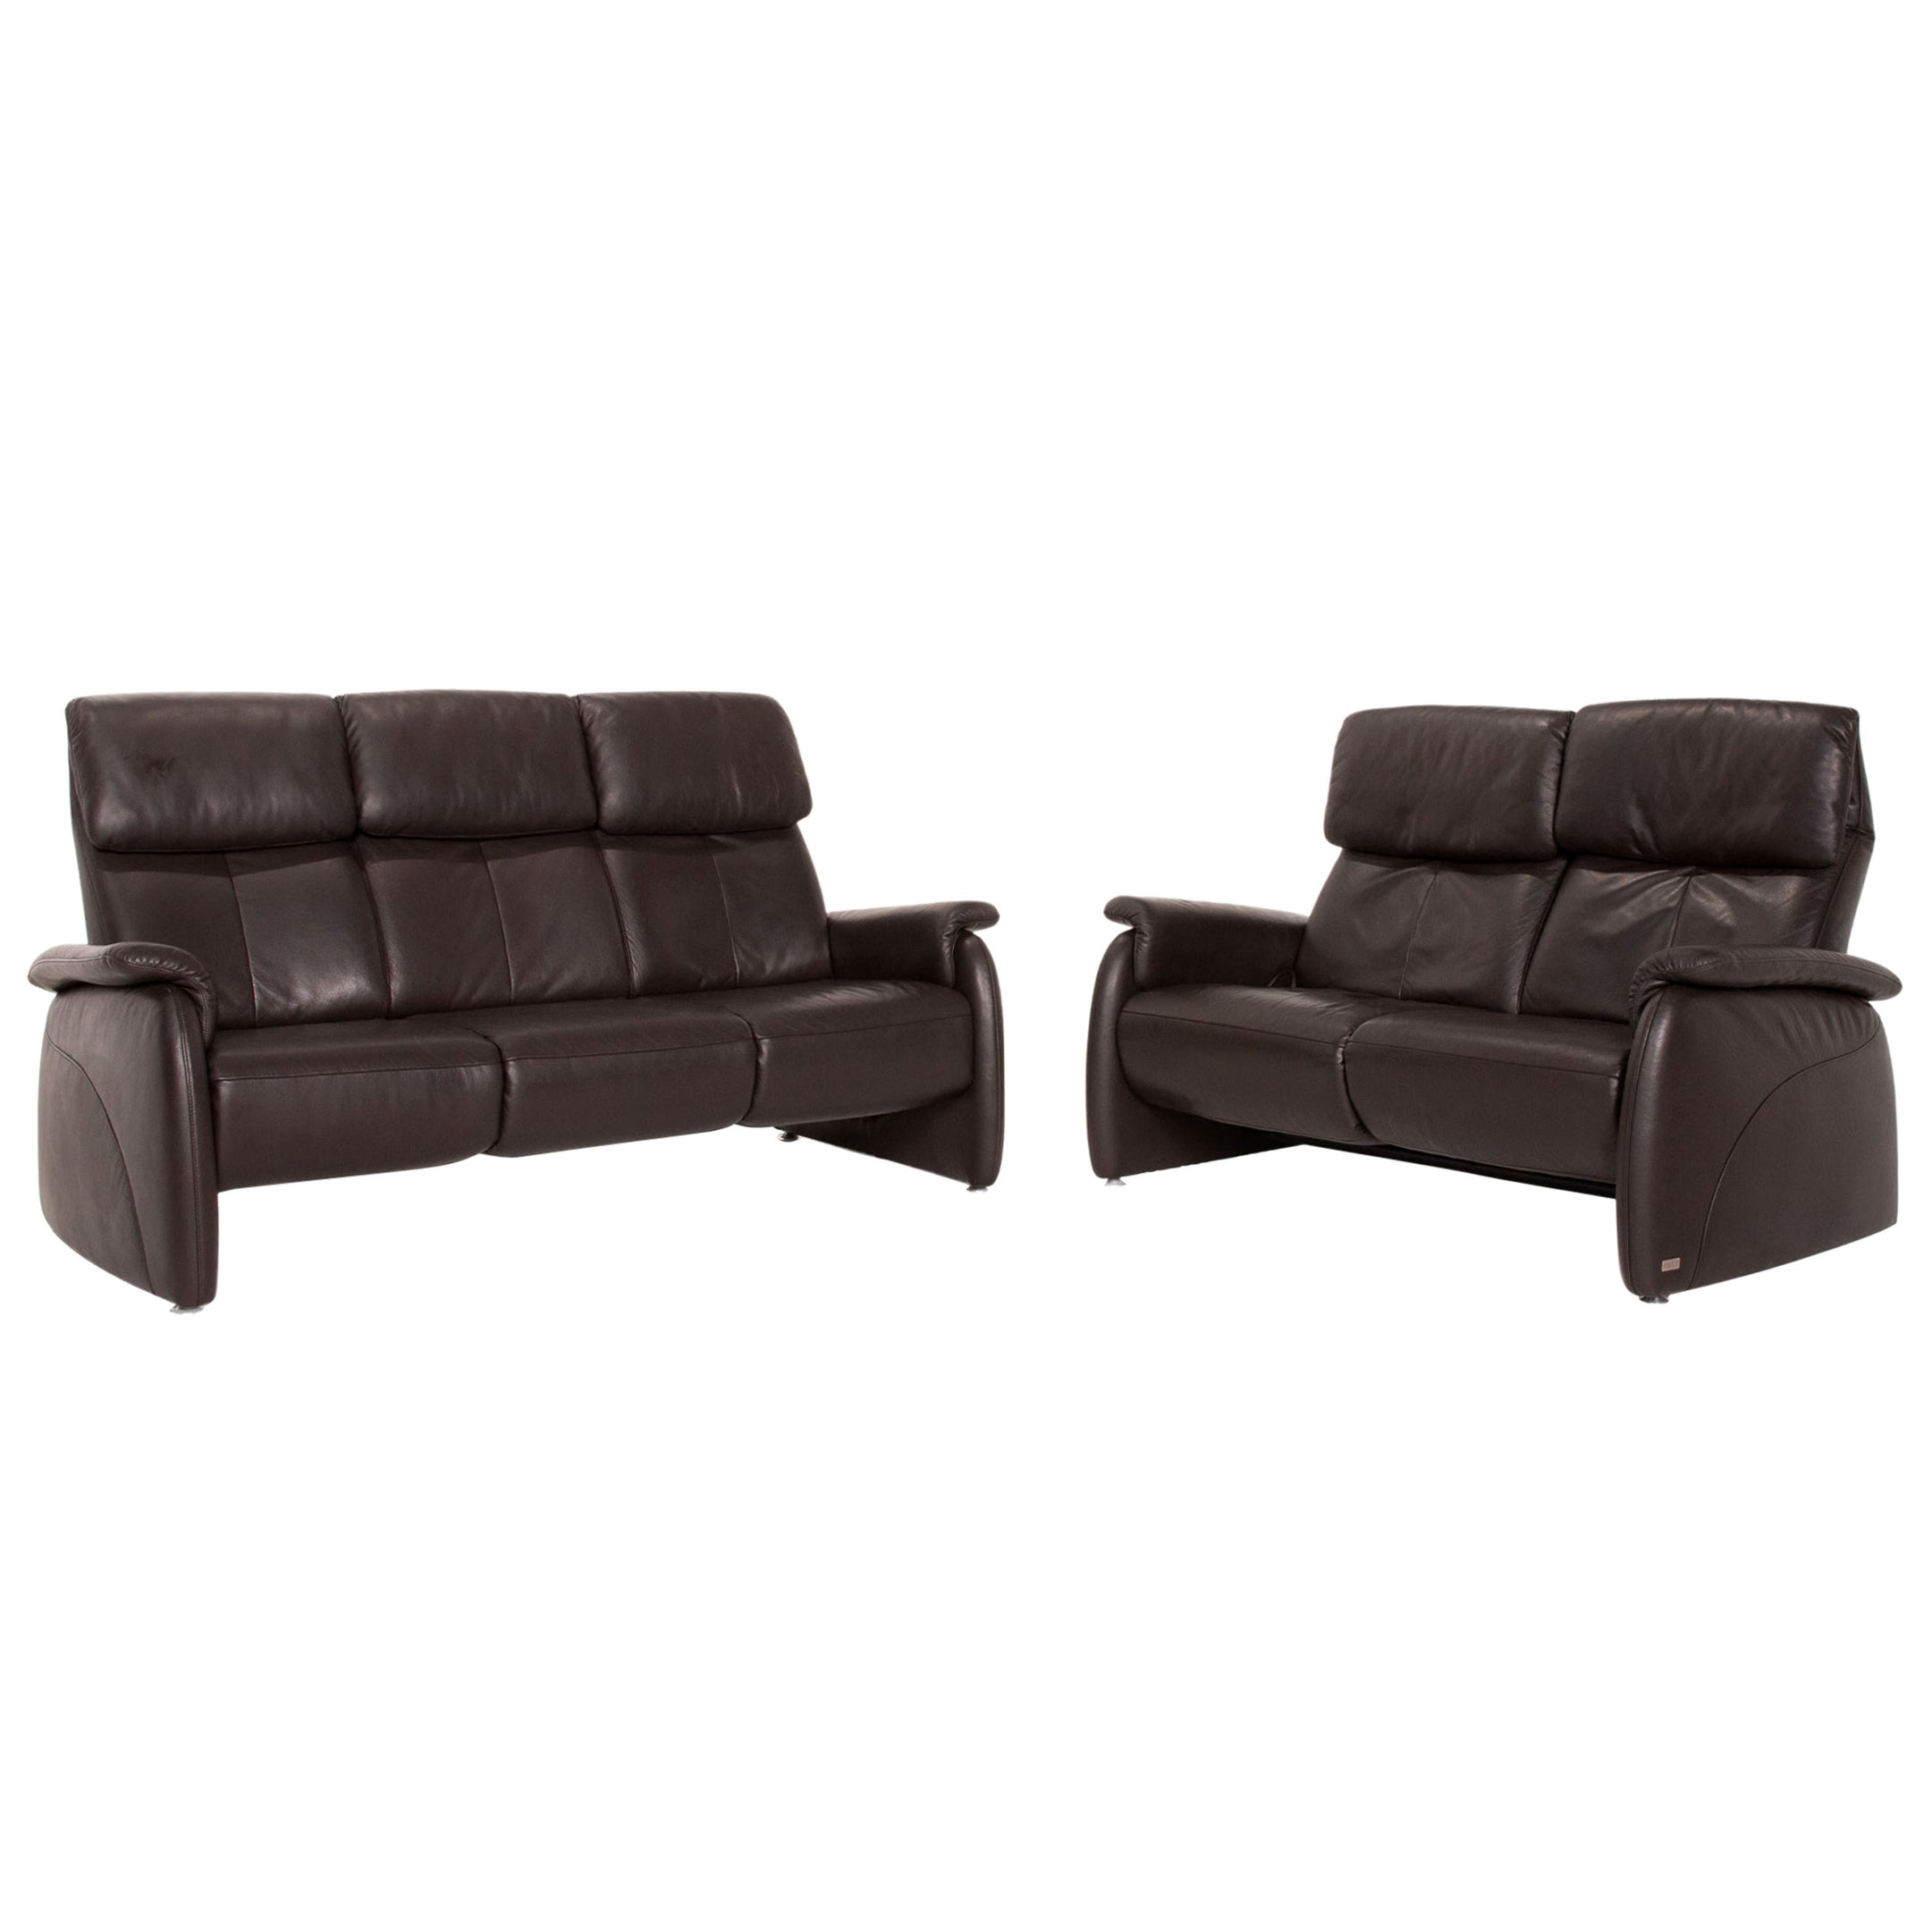 Willi Schillig Leather Sofa Set Brown Dark Brown 1x Three-Seater 1x Two-Seater